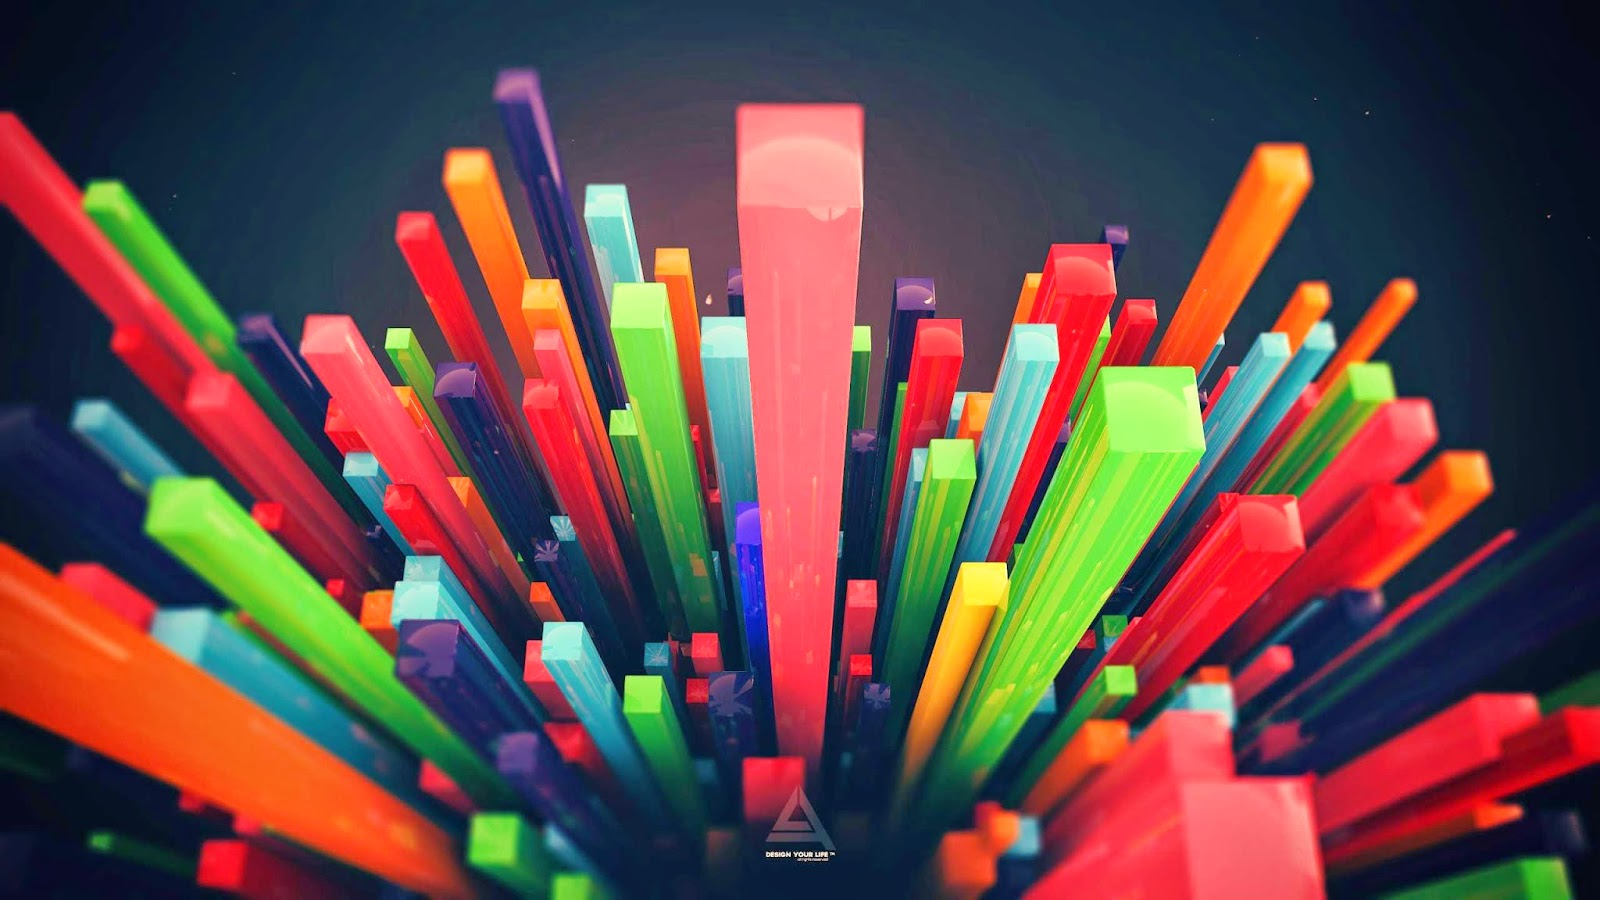 gallery, background, desktop backgrounds, desktop wallpapers, hd desktop backgrounds,